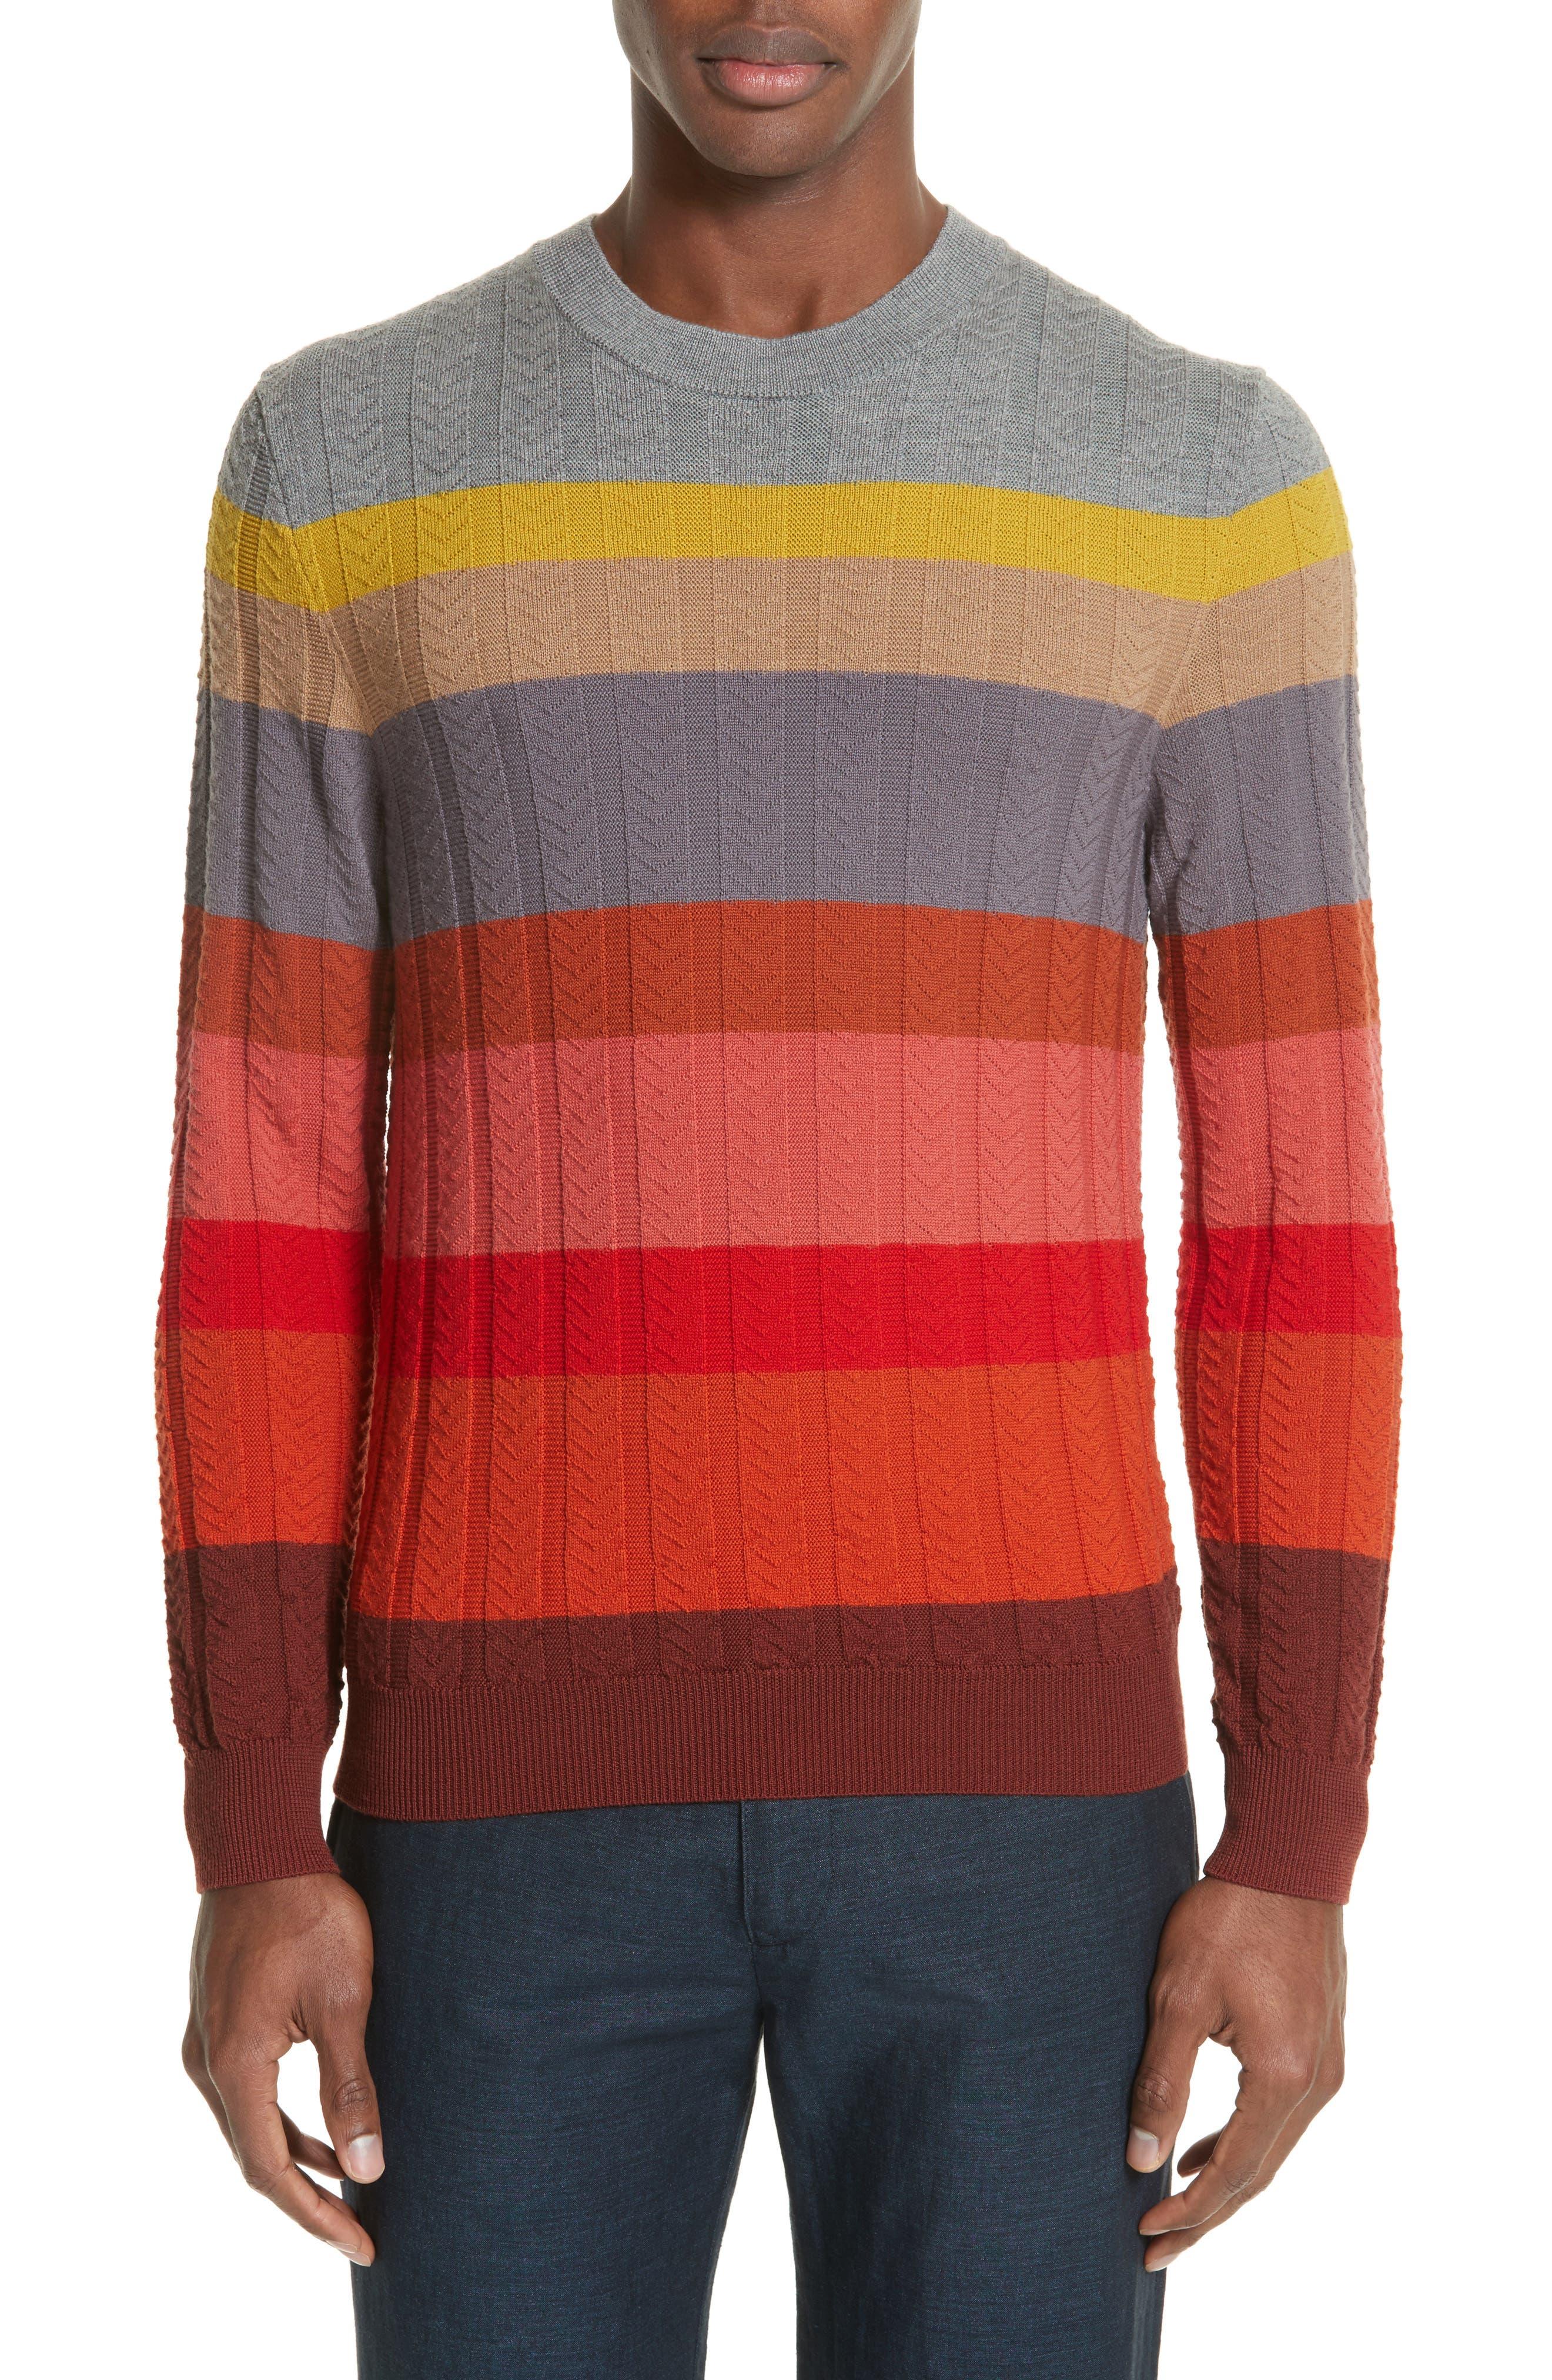 Paul Smith Multistripe Merino Cable Knit Sweater